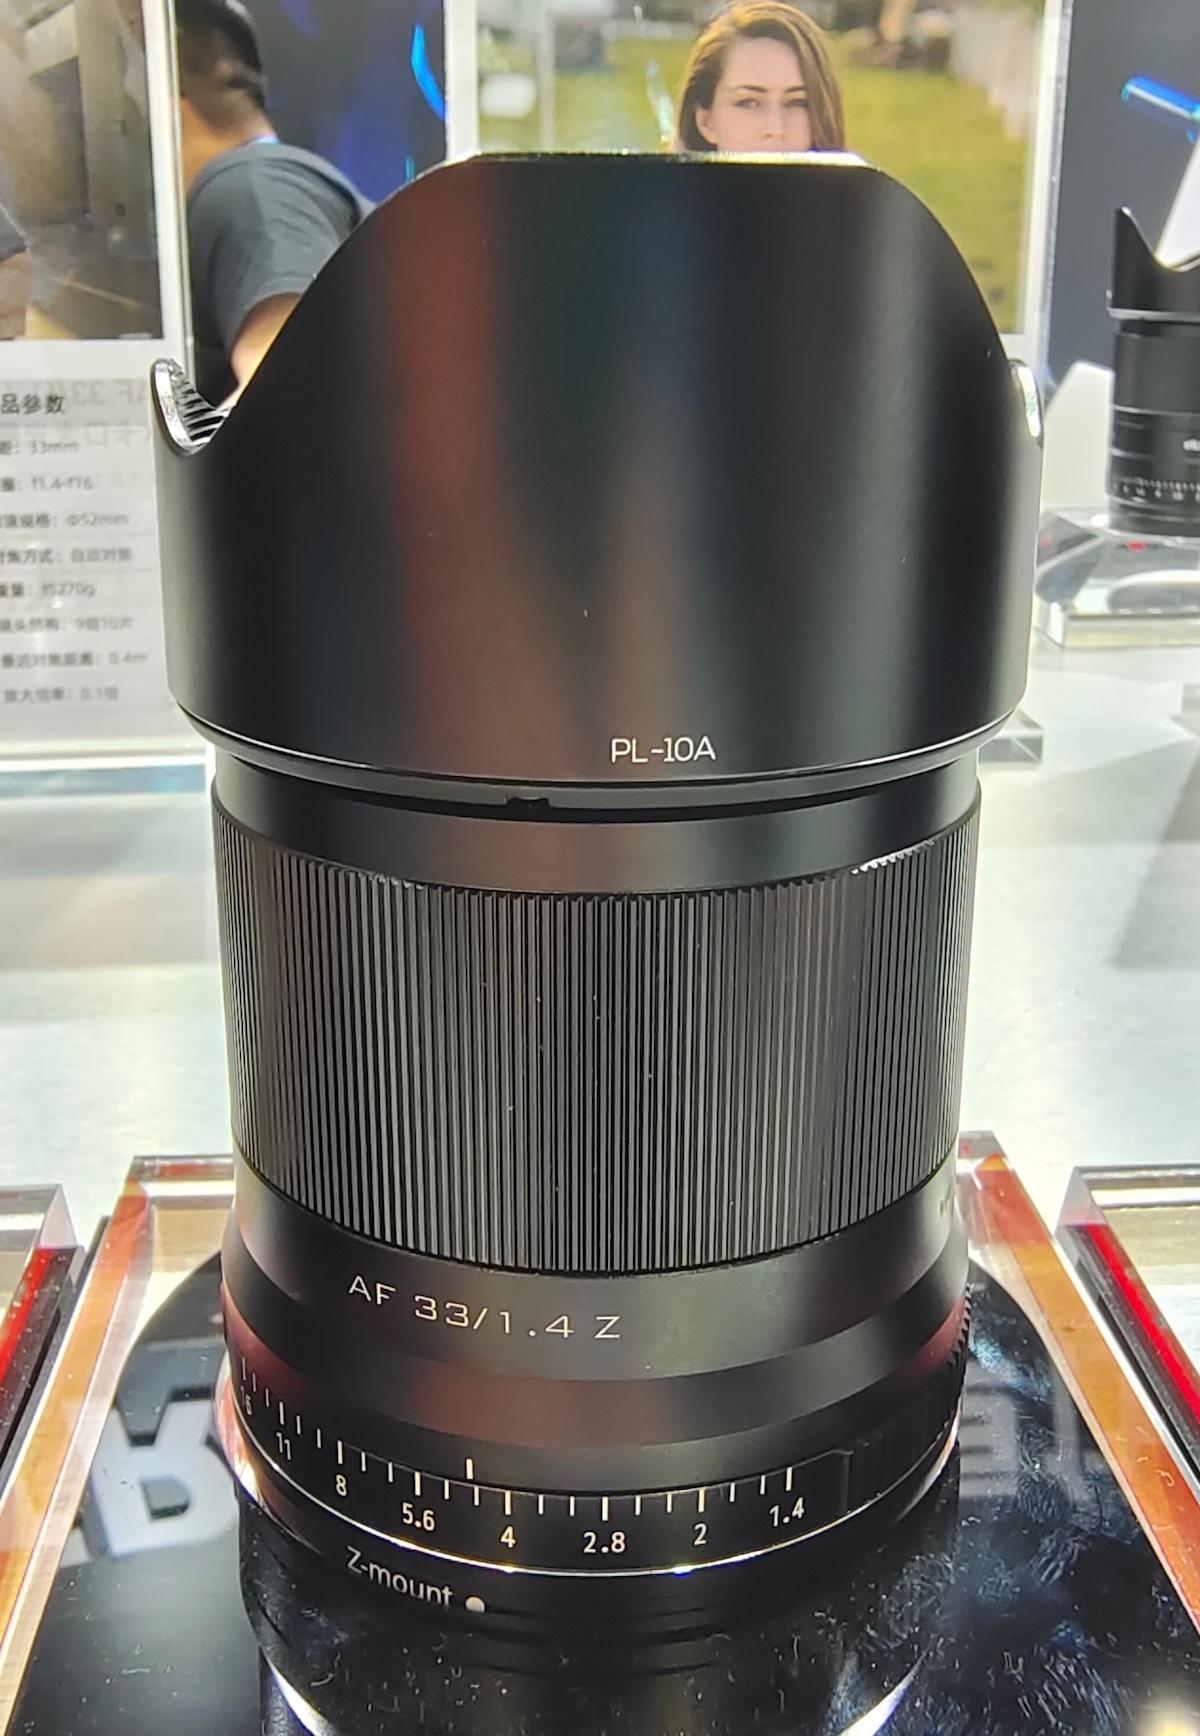 Объектив Viltrox AF 33mm f/1.4 Z (APS-C)